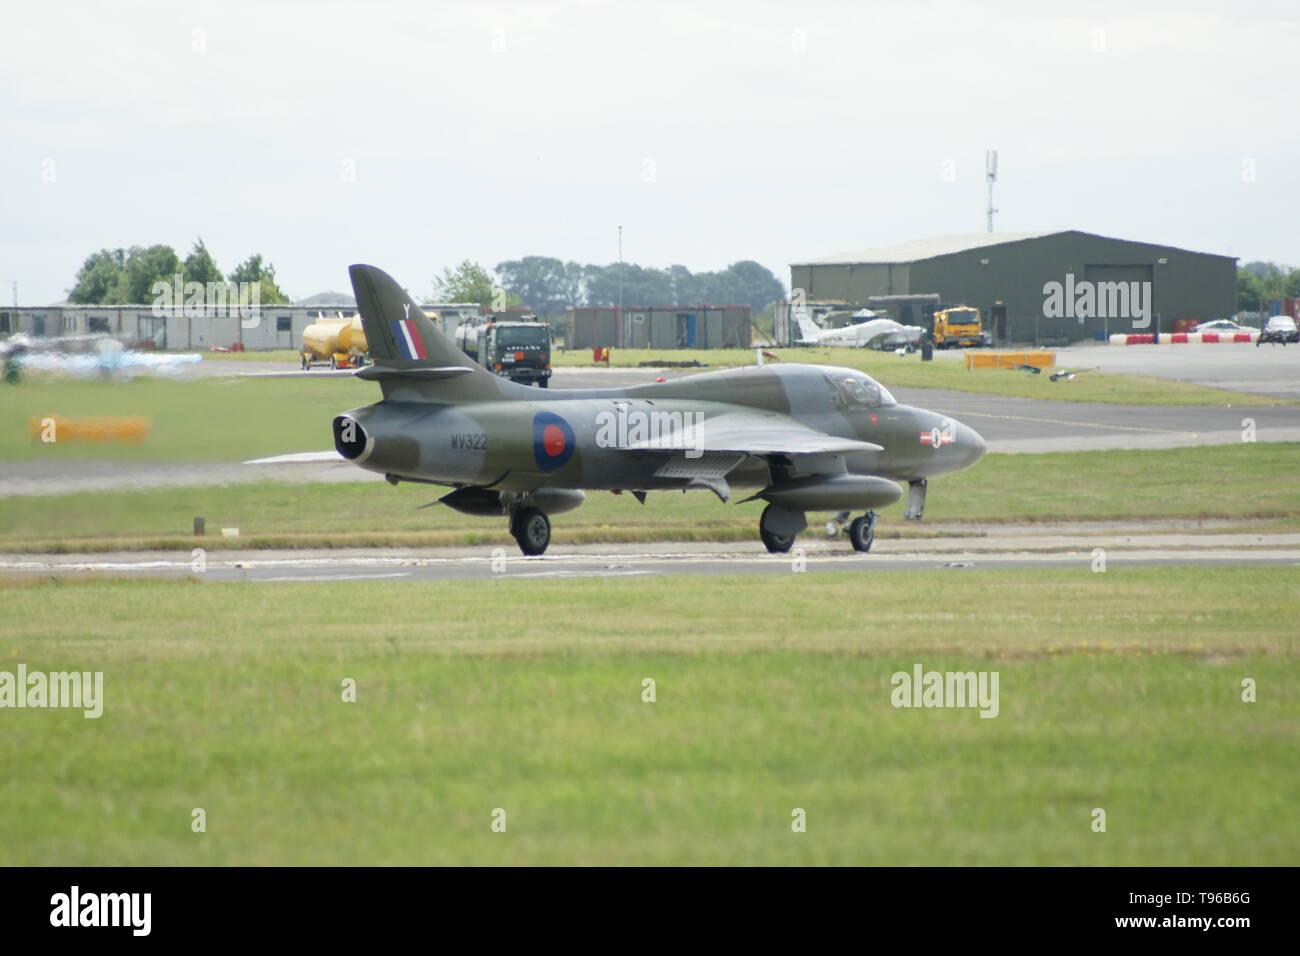 Hawker Hunter, cold war jet fighter - Stock Image